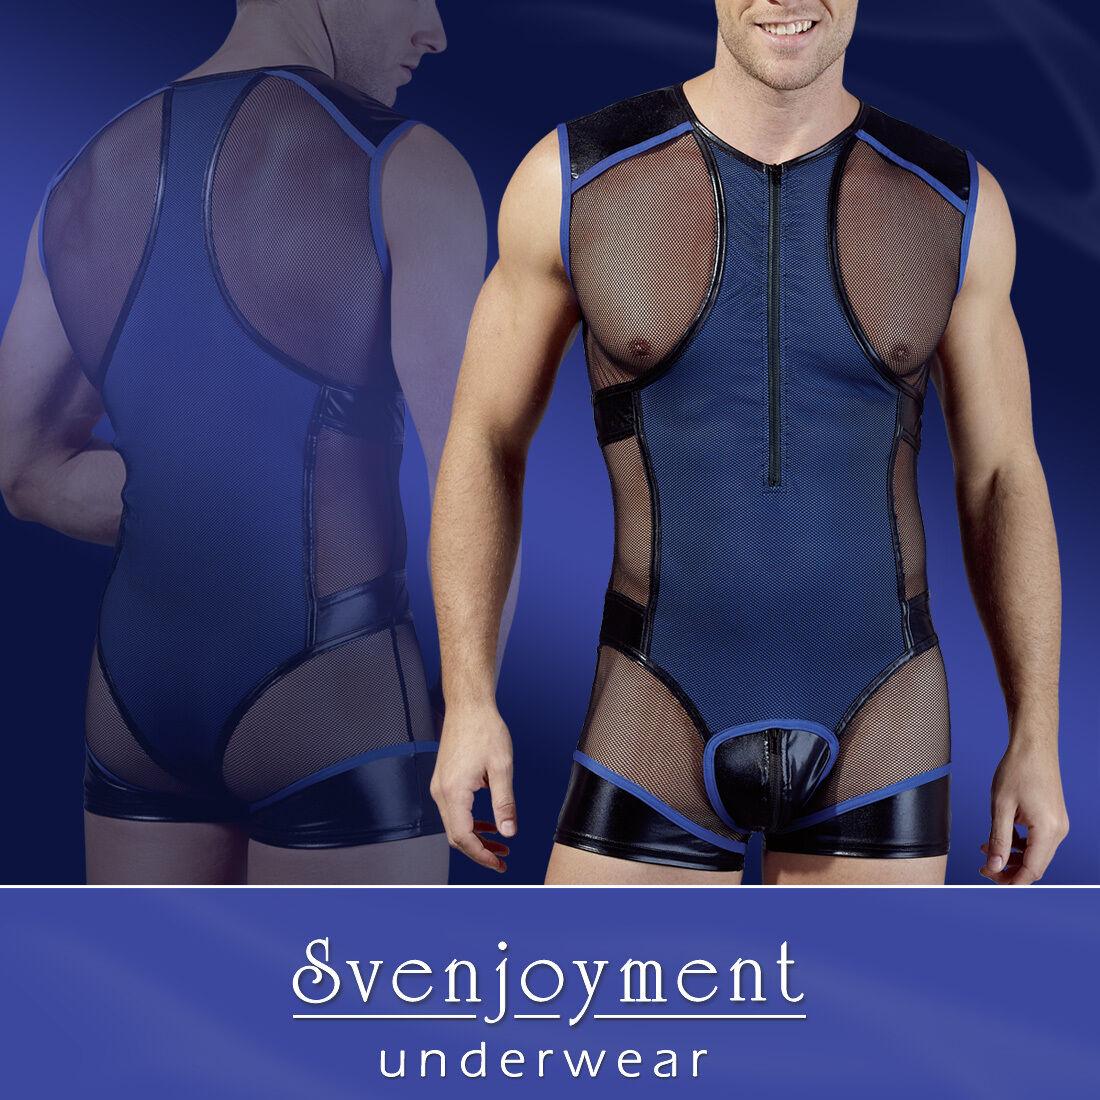 Uomo Body  Royal  - Biancheria Intima Uomini Slip Pants Boxershorts perizoma